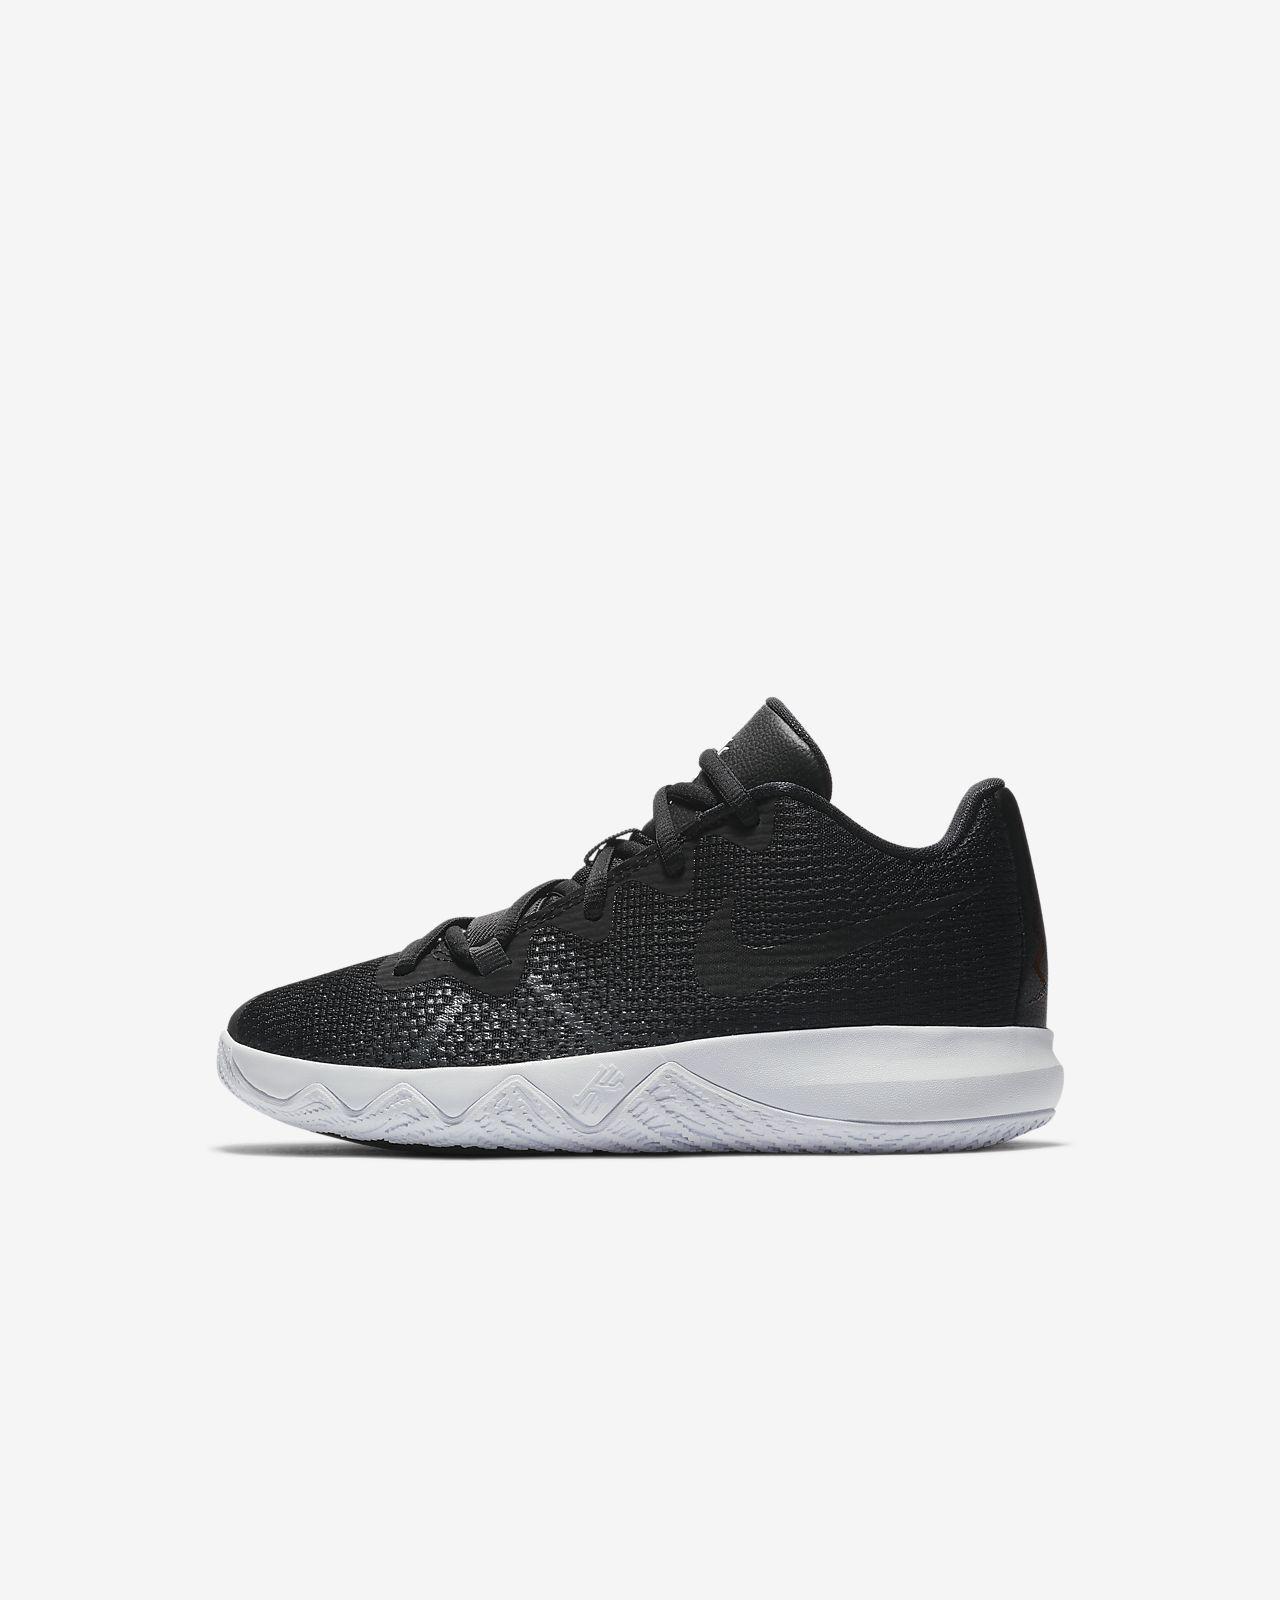 89fb63f589e Kyrie Flytrap Little Kids  Shoe. Nike.com